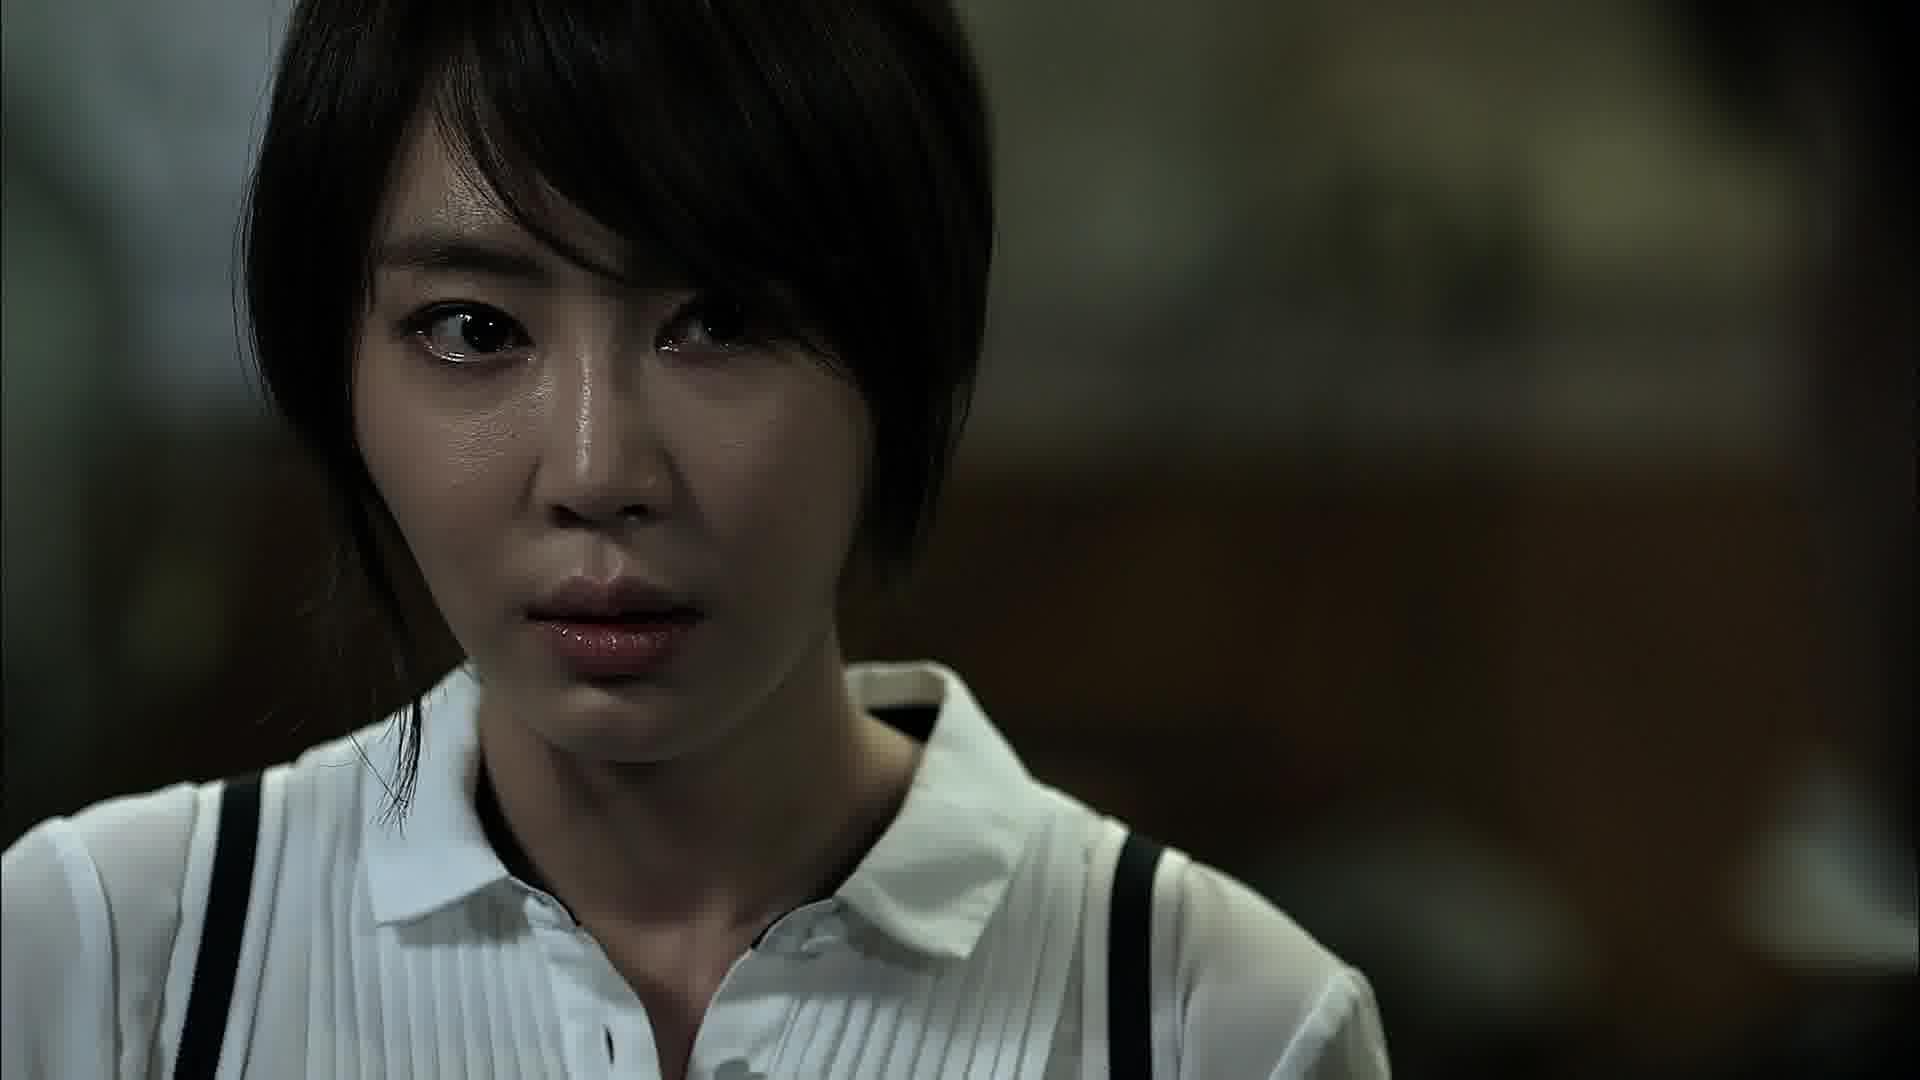 bad guys 나쁜녀석들 watch full episodes free korea tv shows